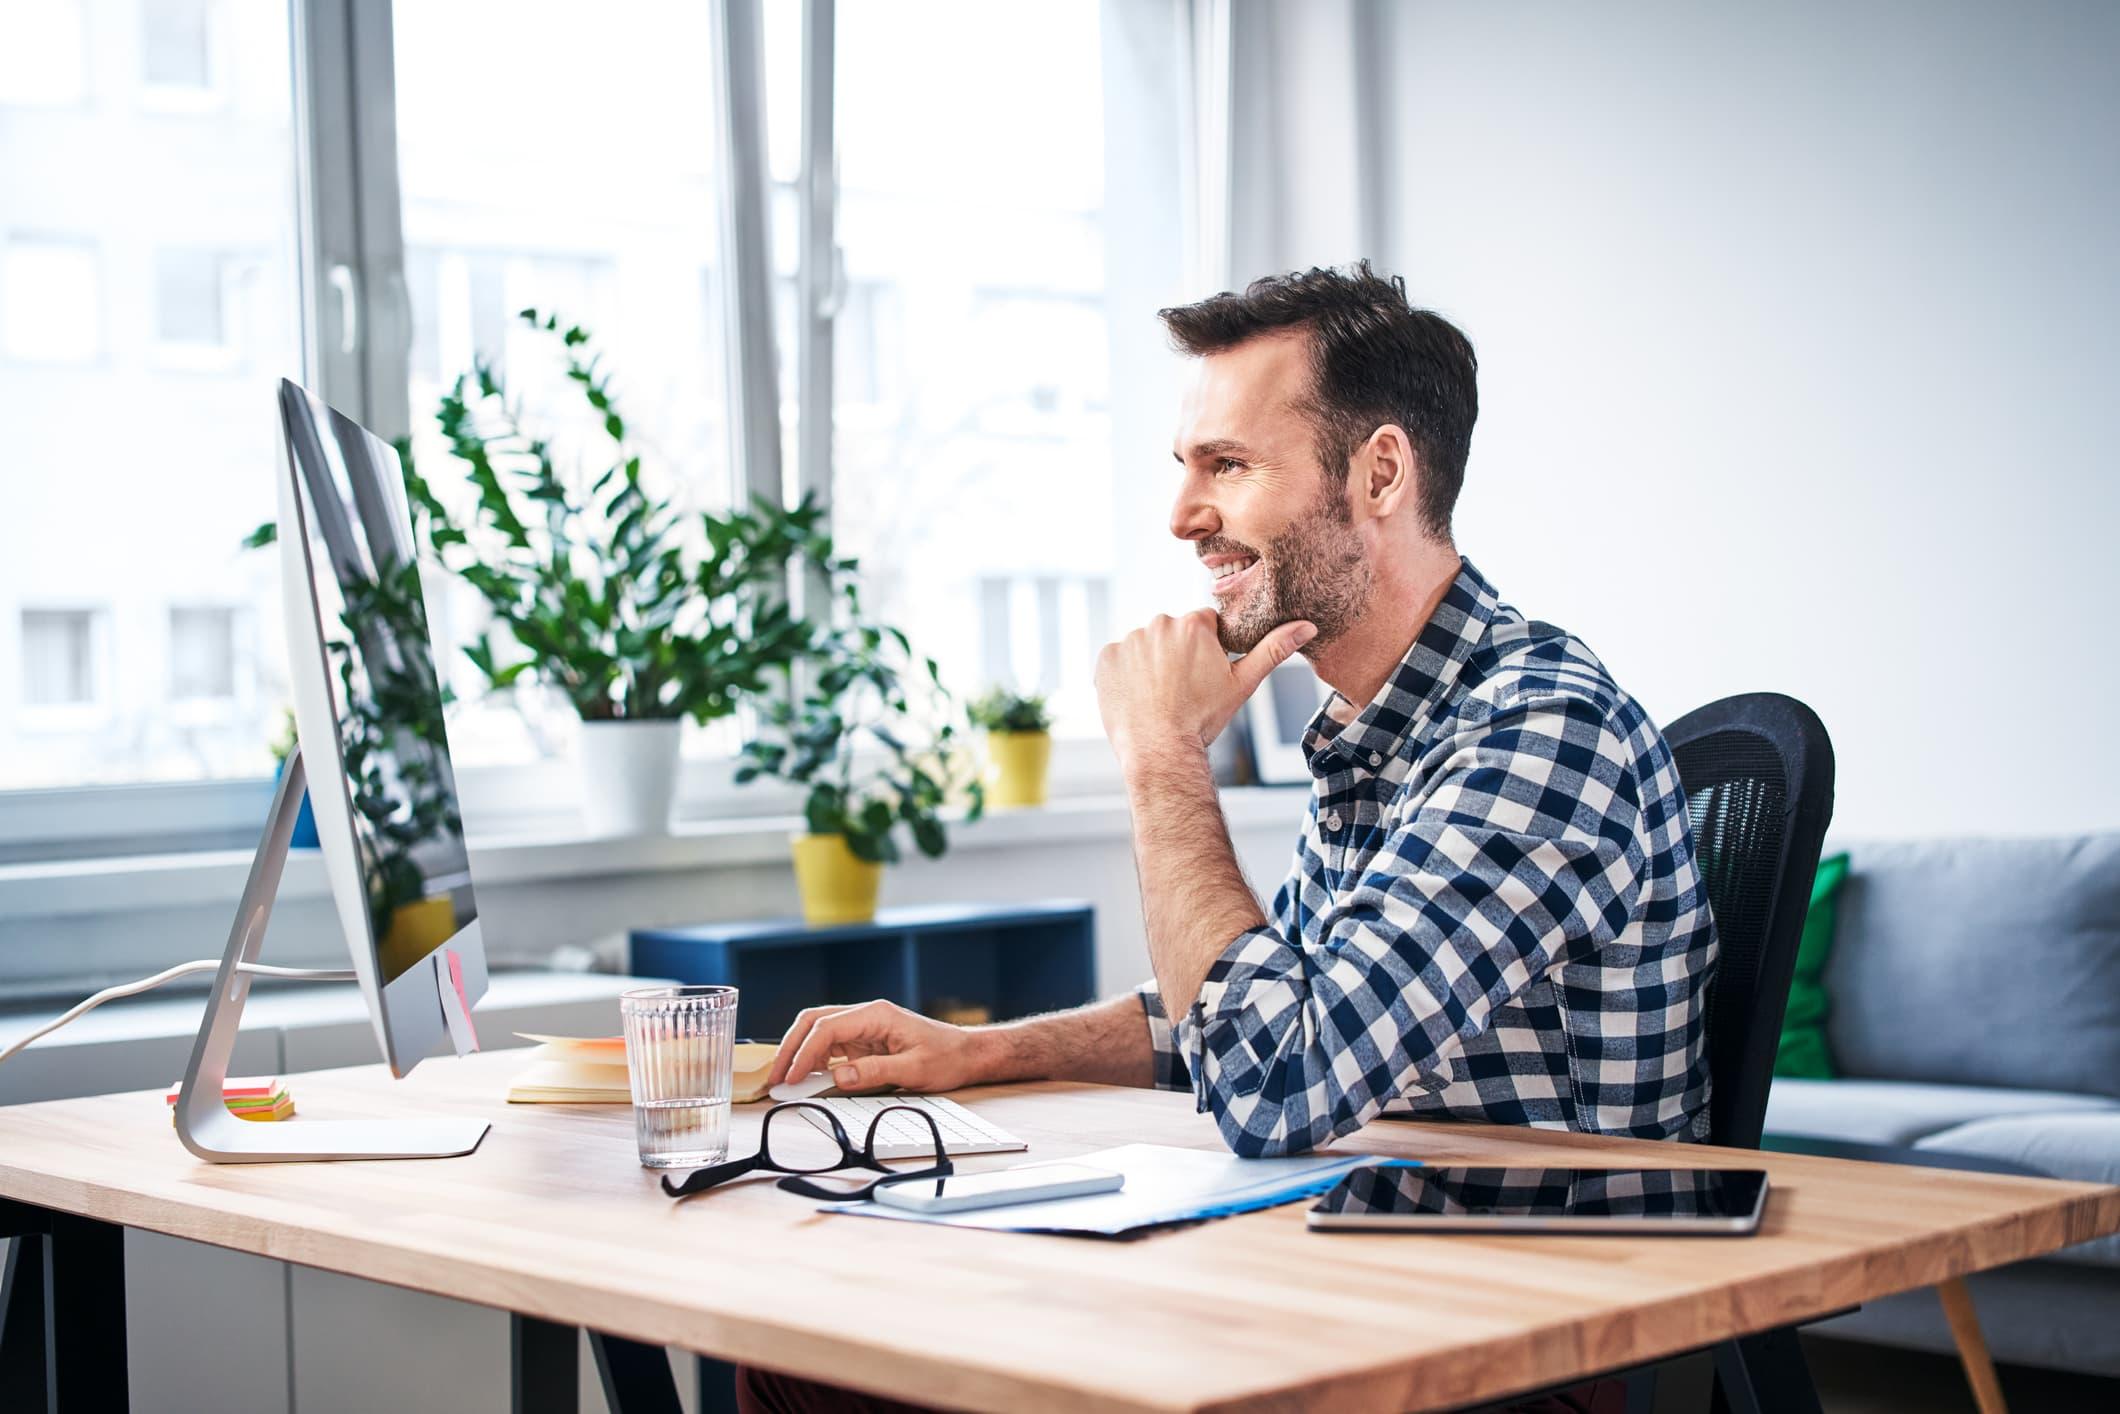 How do freelance work цена работы фрилансера